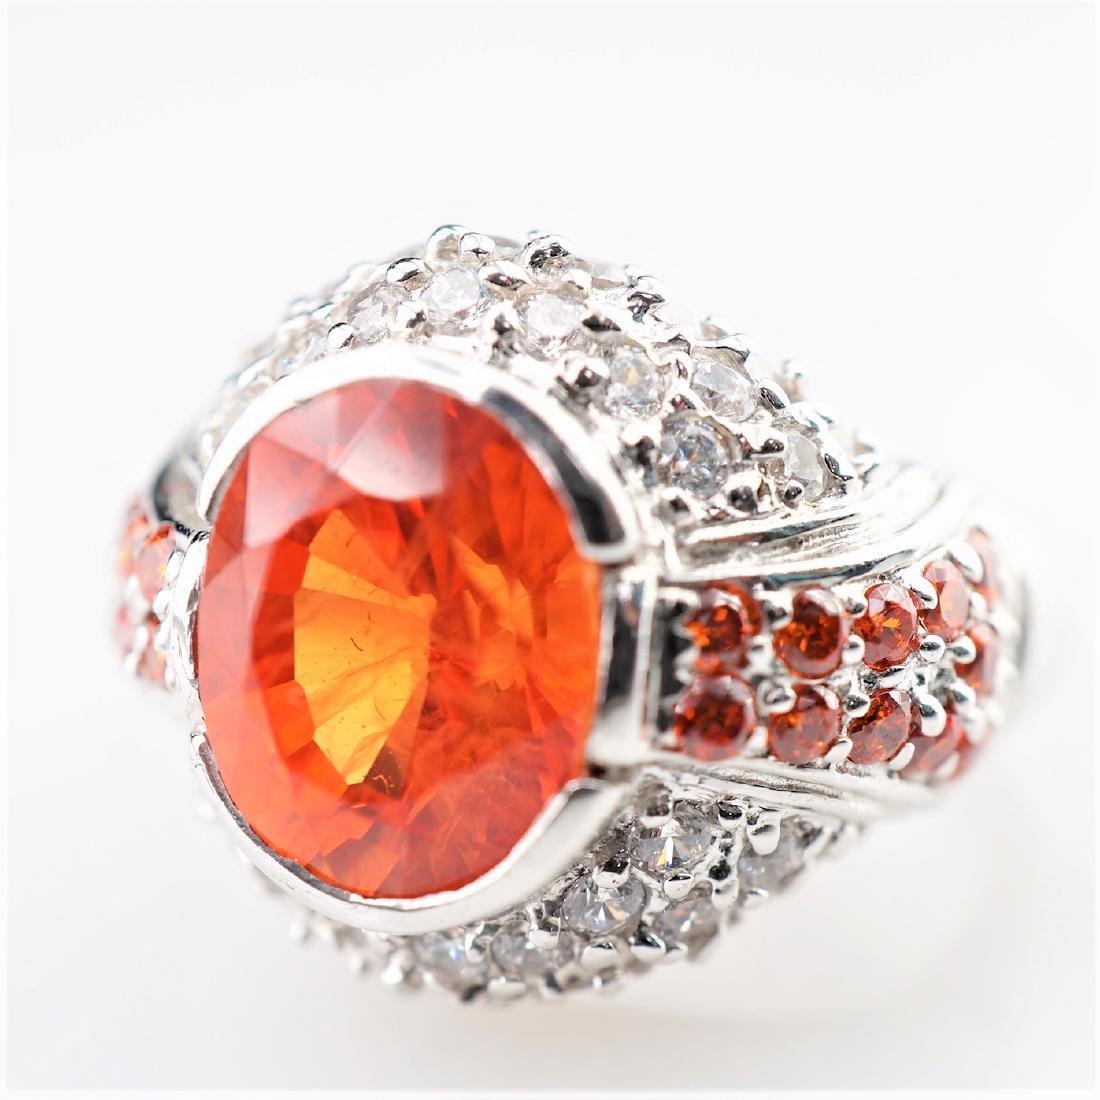 2.50 CT Padparadscha Sapphire Ring sz 6.5